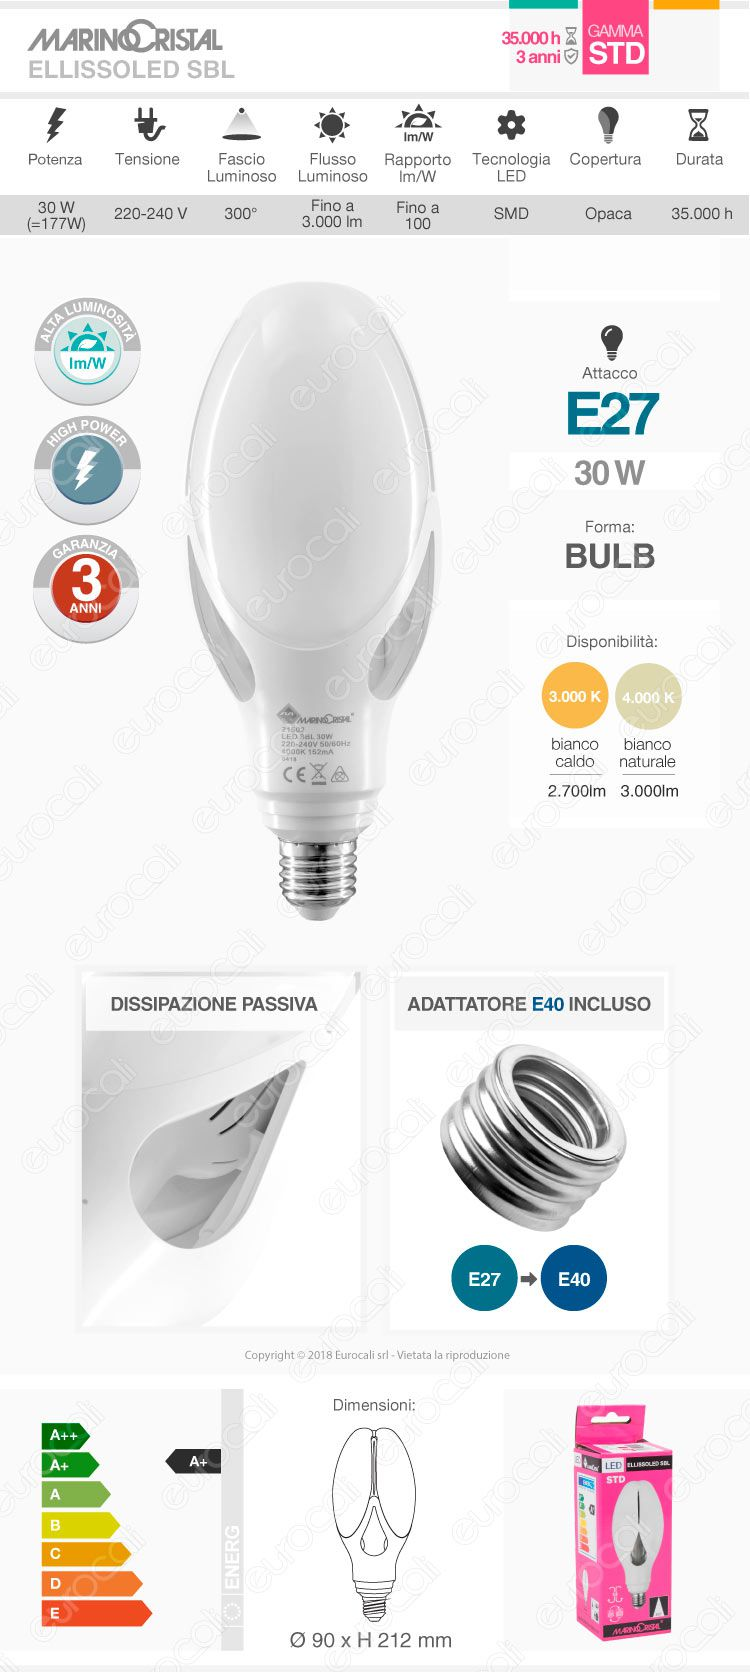 Marino Cristal Serie STD Lampadina LED Bulb Hi-Power E27 30W - mod. 21501 / 21502